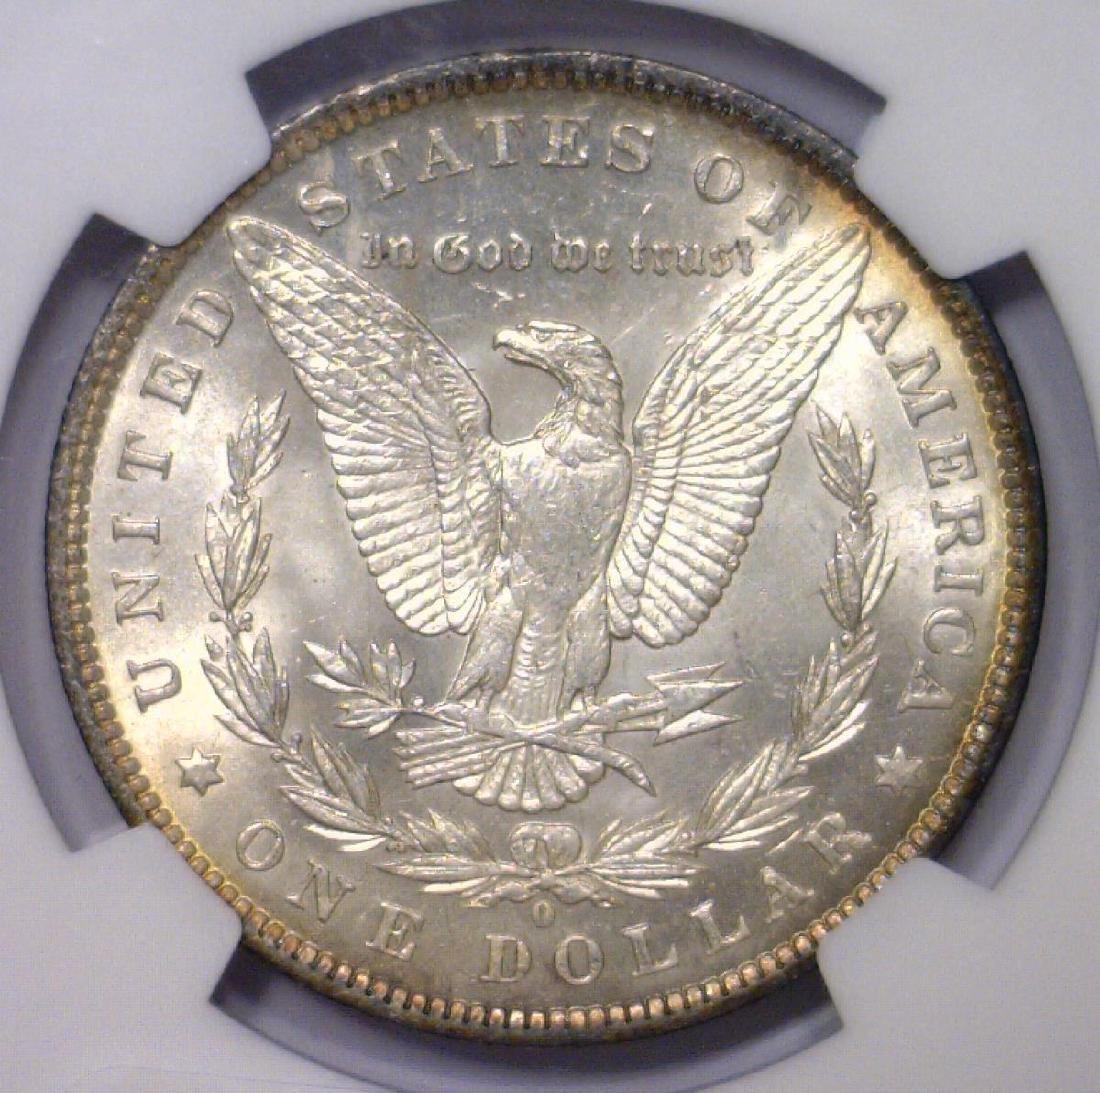 1883-O Morgan Silver Dollar NGC UNC det. obv clnd - 3